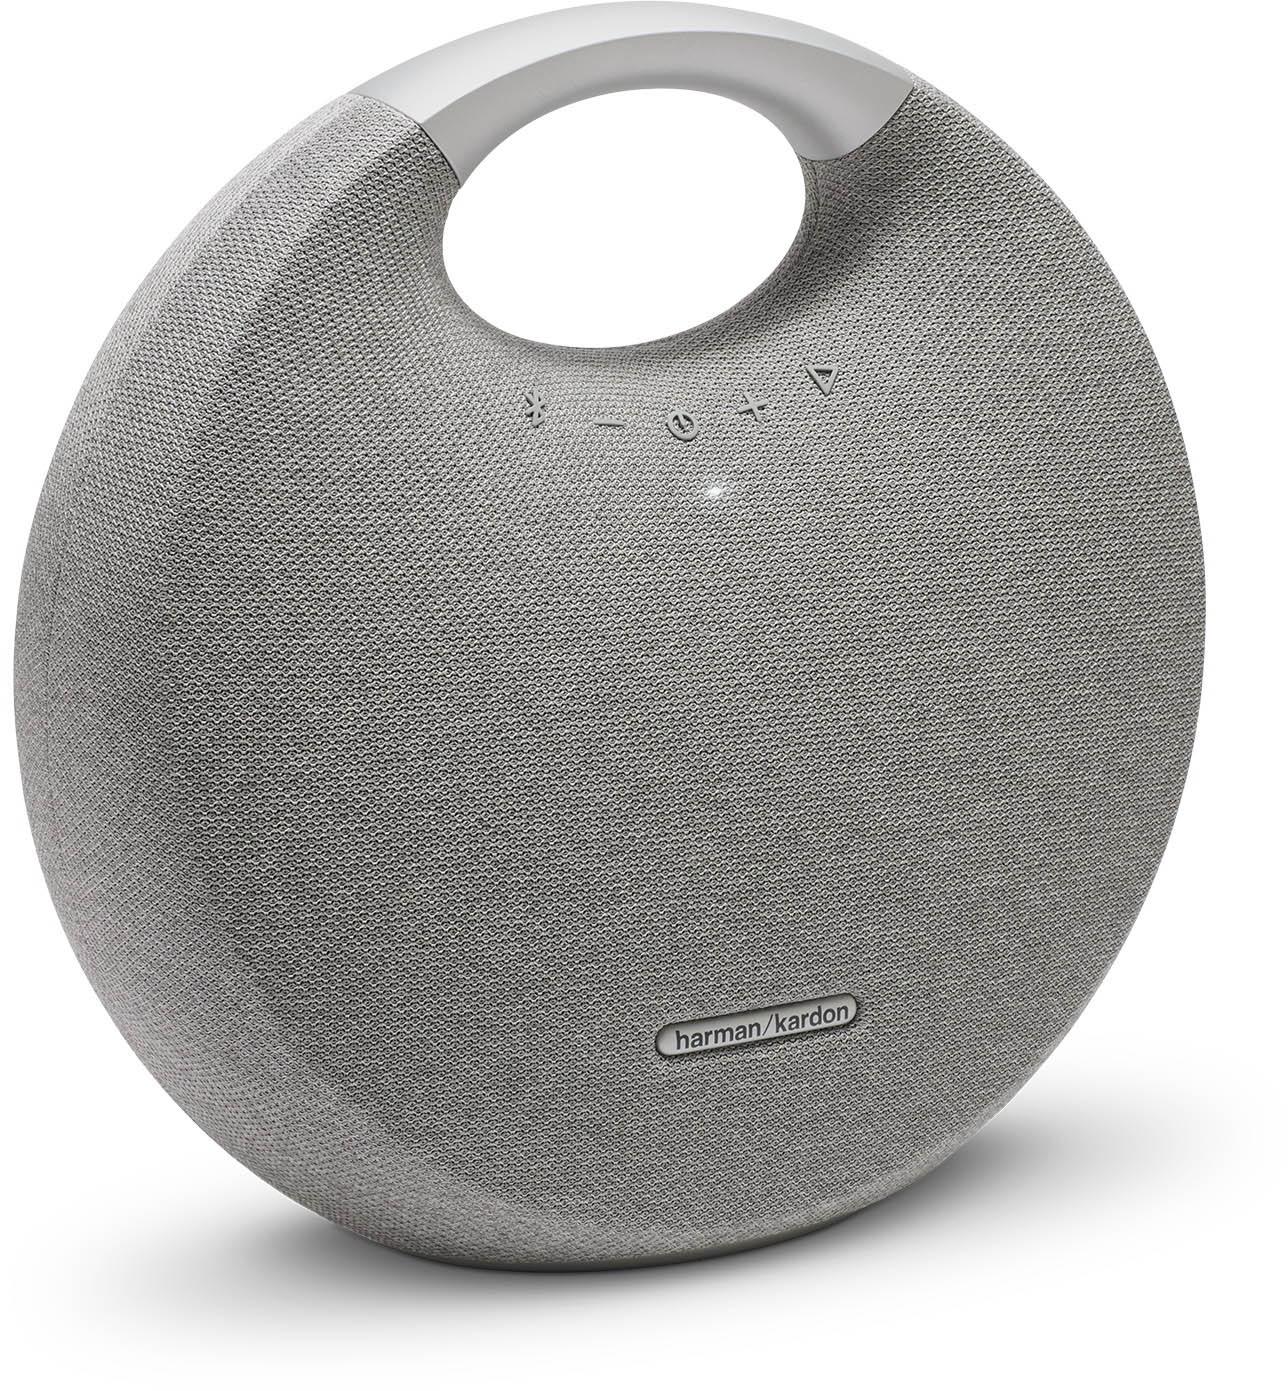 Фото - Портативная акустика Harman/Kardon Onyx Studio 5, Grey lg electronics tone infinim hbs 900 bluetooth headphones harman kardon sound retail packaging